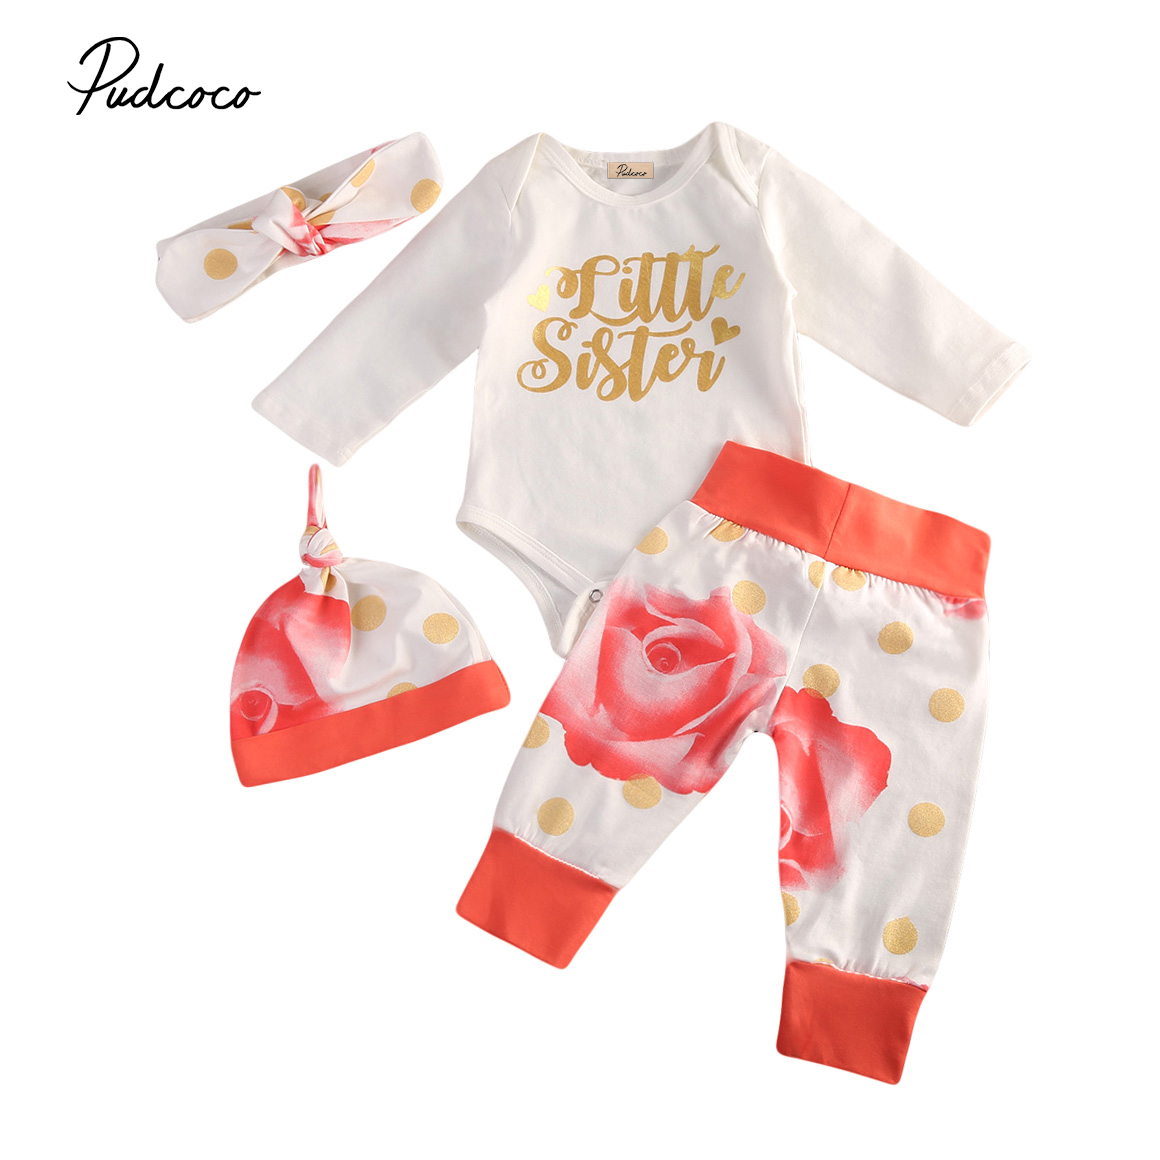 4Pcs Newborn Baby Girls Clothing Sets Toddler Flower Romper Long Pants Legging Hat Outfits Set